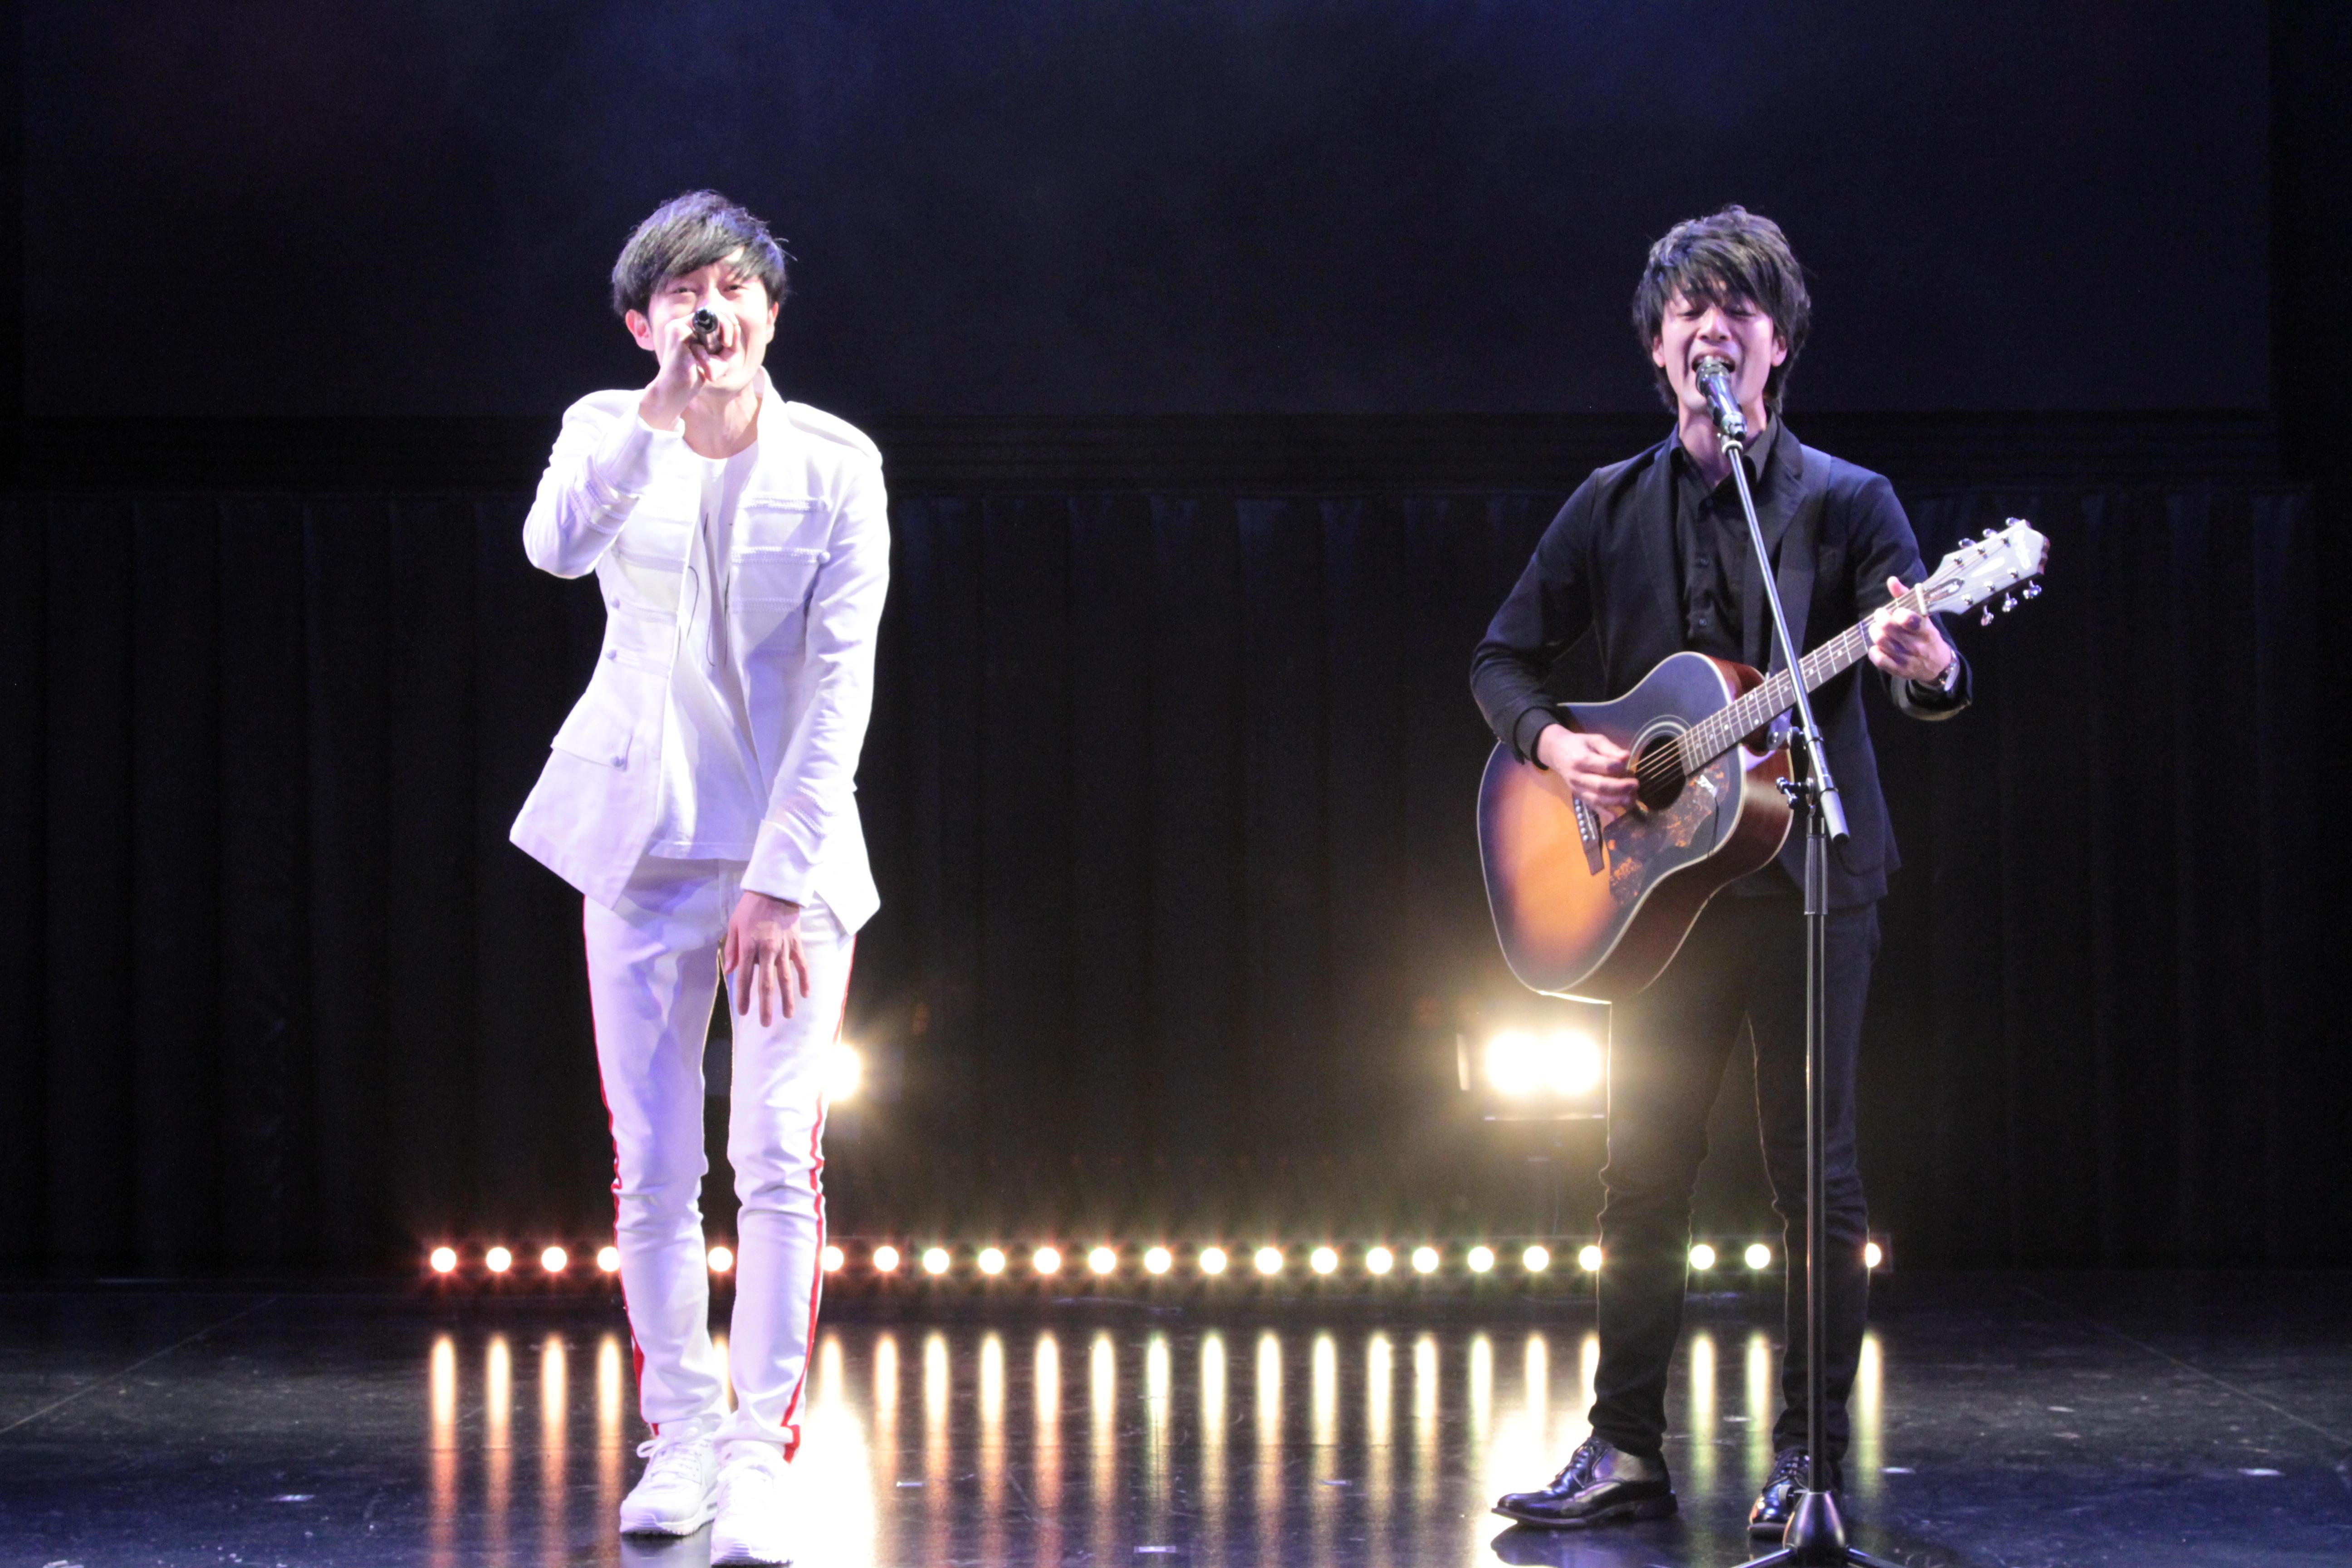 http://news.yoshimoto.co.jp/20190107135626-9c7a7bebaee3110e6bcf952a8638a3e3569aeb31.jpg